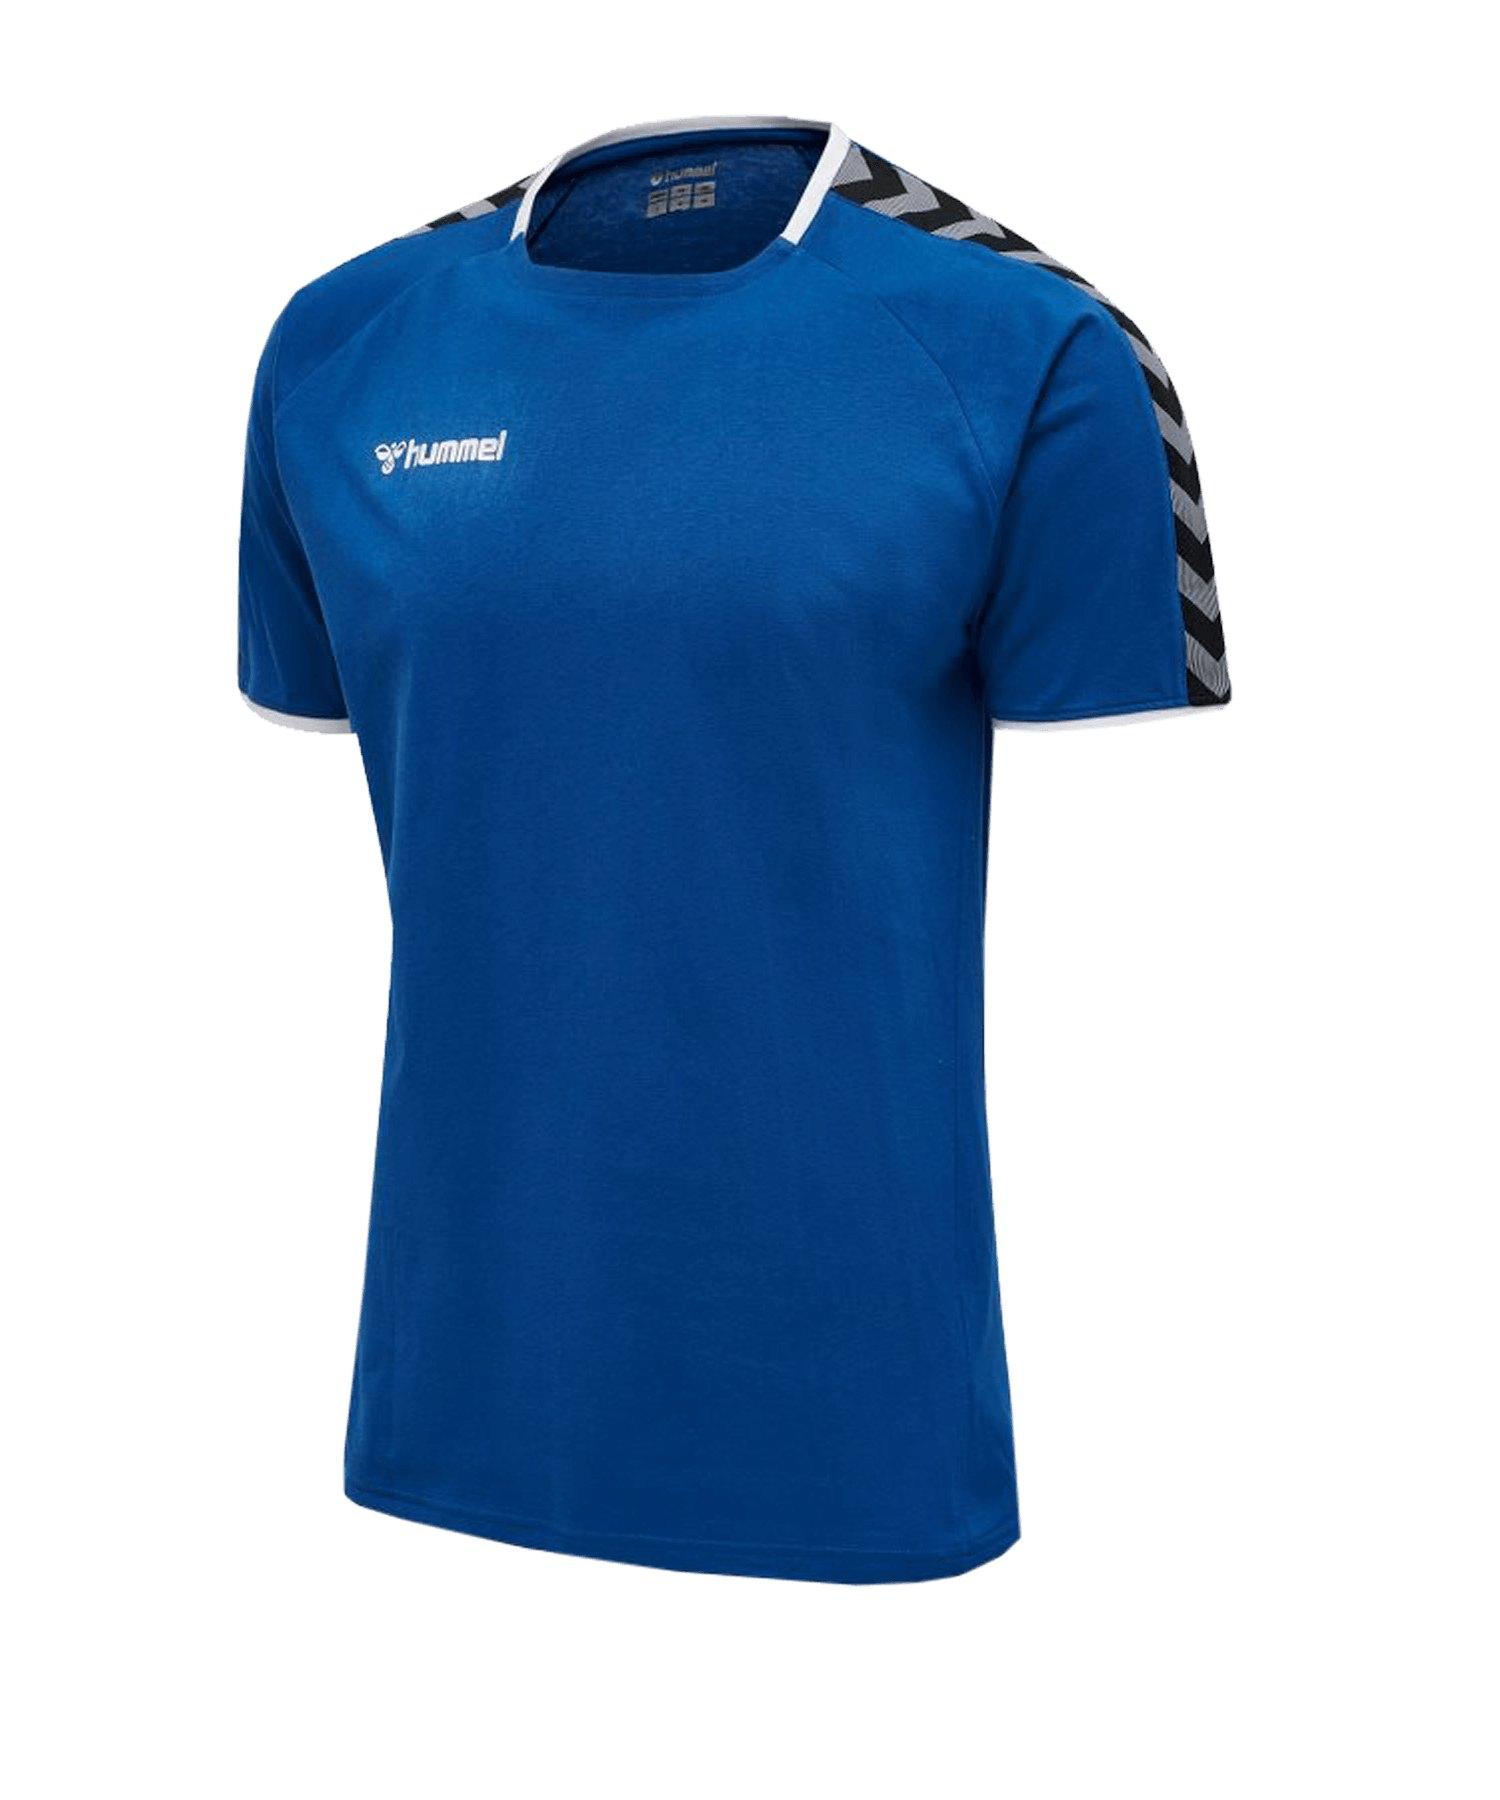 Hummel Authentic Trainingsshirt Blau F7045 - blau